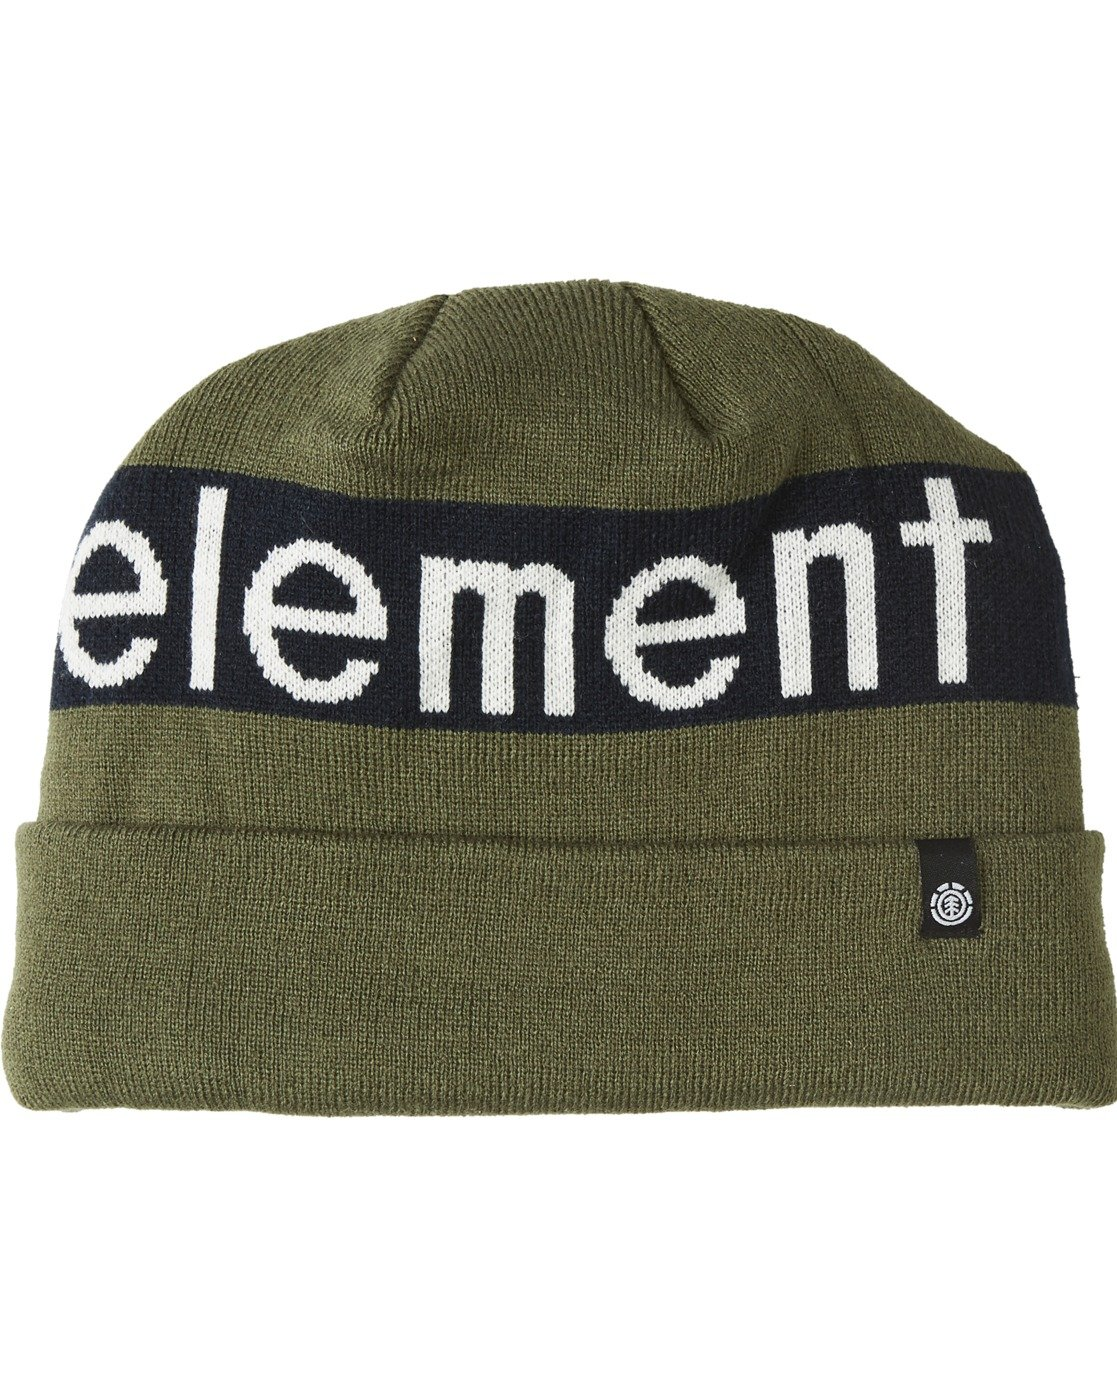 1 FTN Polar Beanie Beige MABN3EFT Element